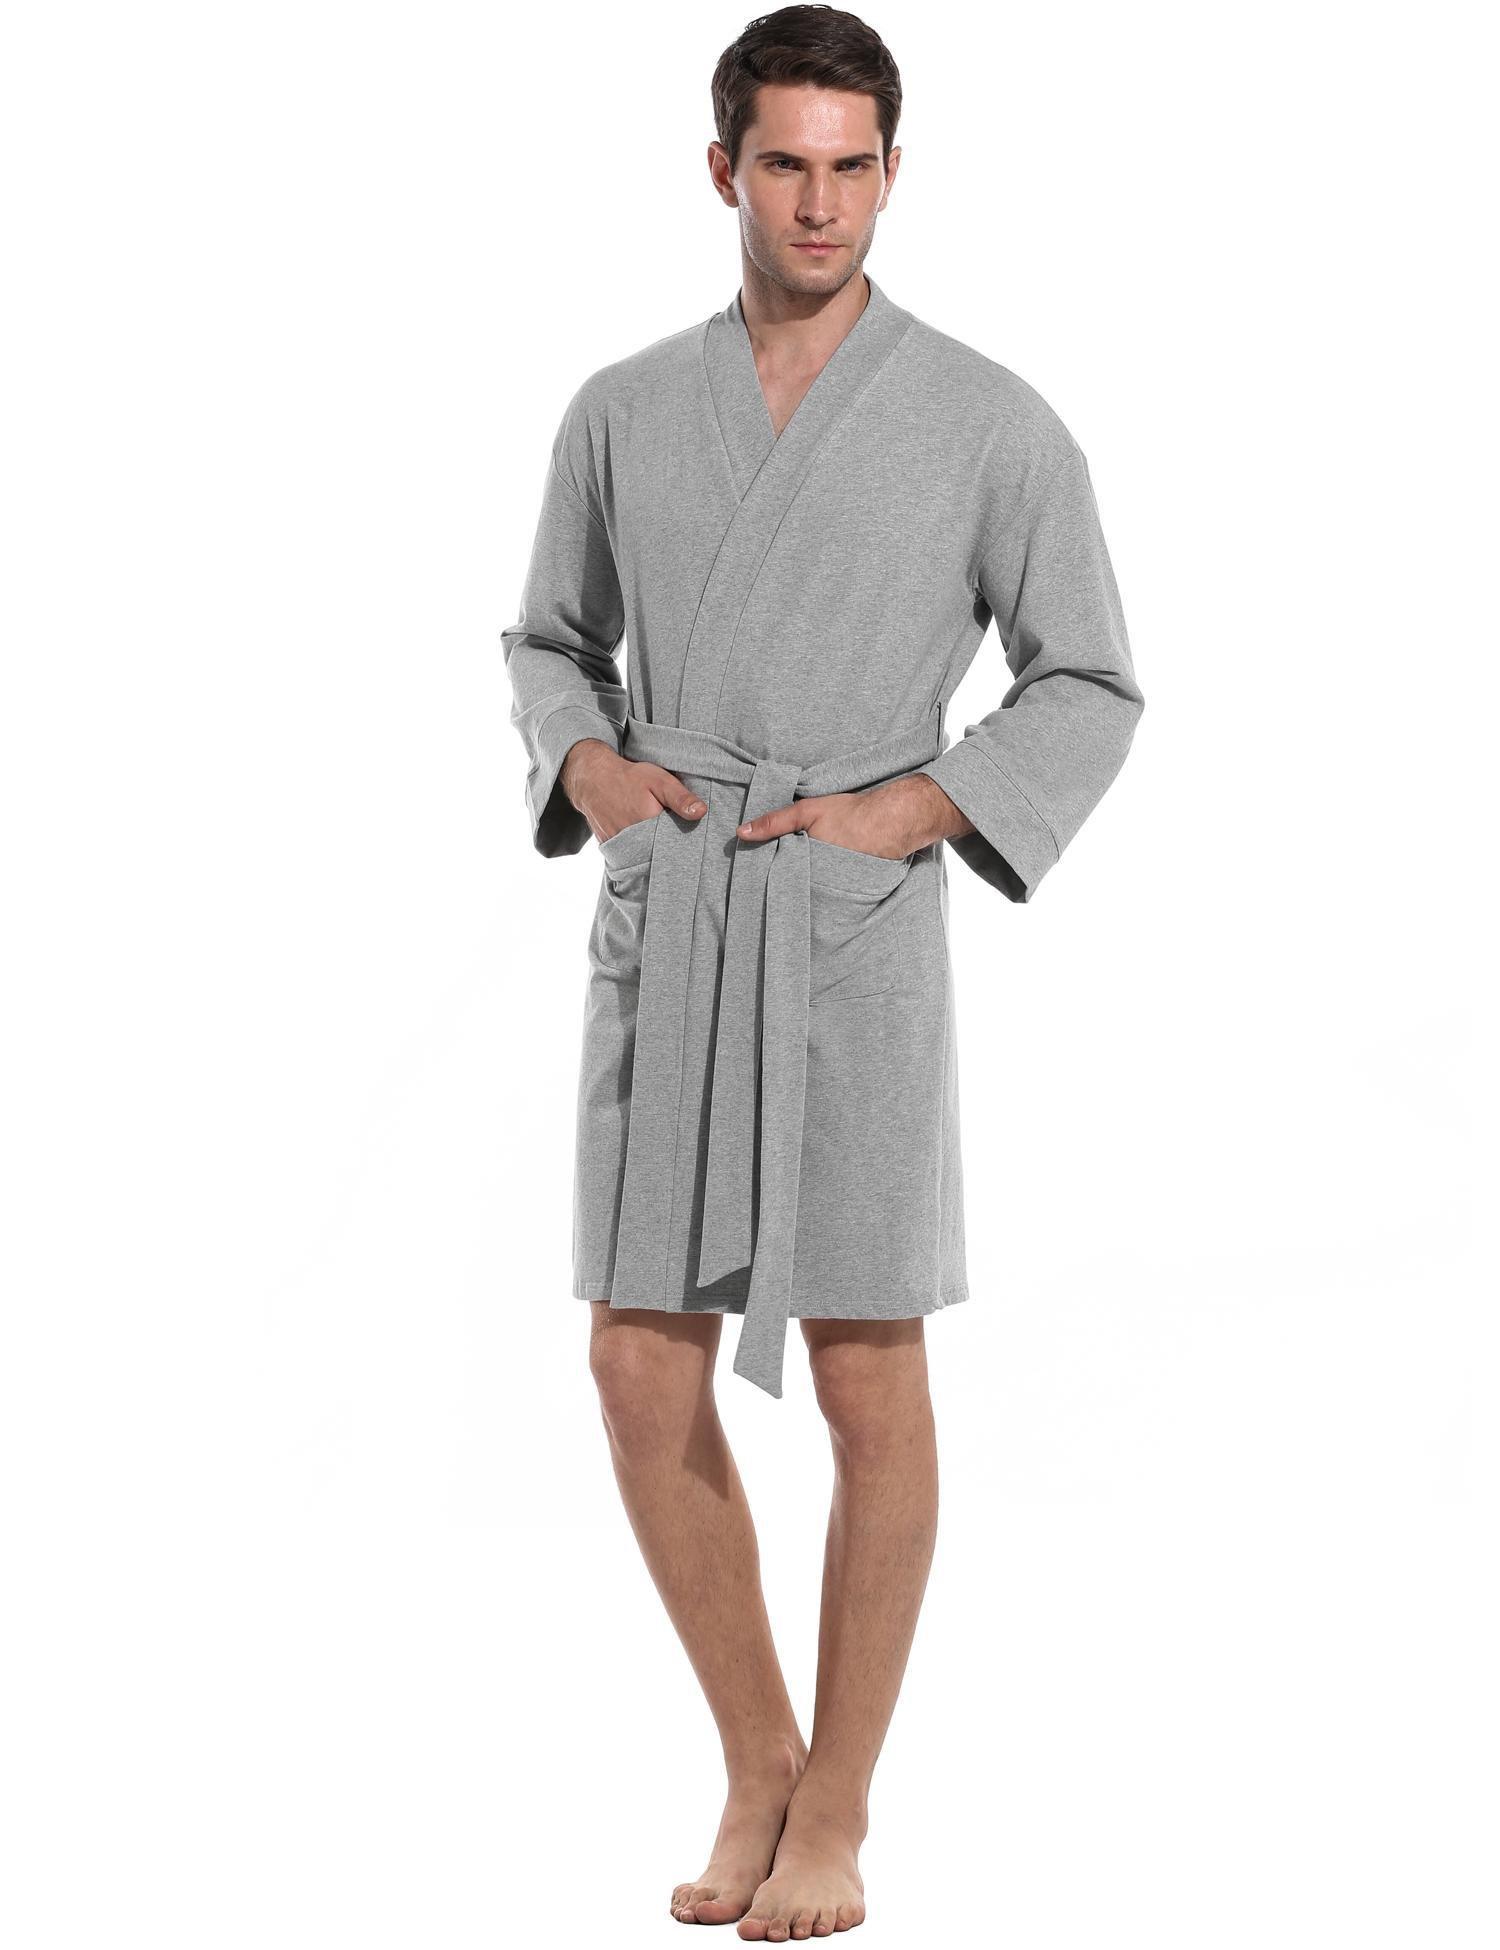 Goldenfox Classy Mens Spa Hotel Bathrobe Kimono Robe Long Lightweight Loungewear (Gray, Small)